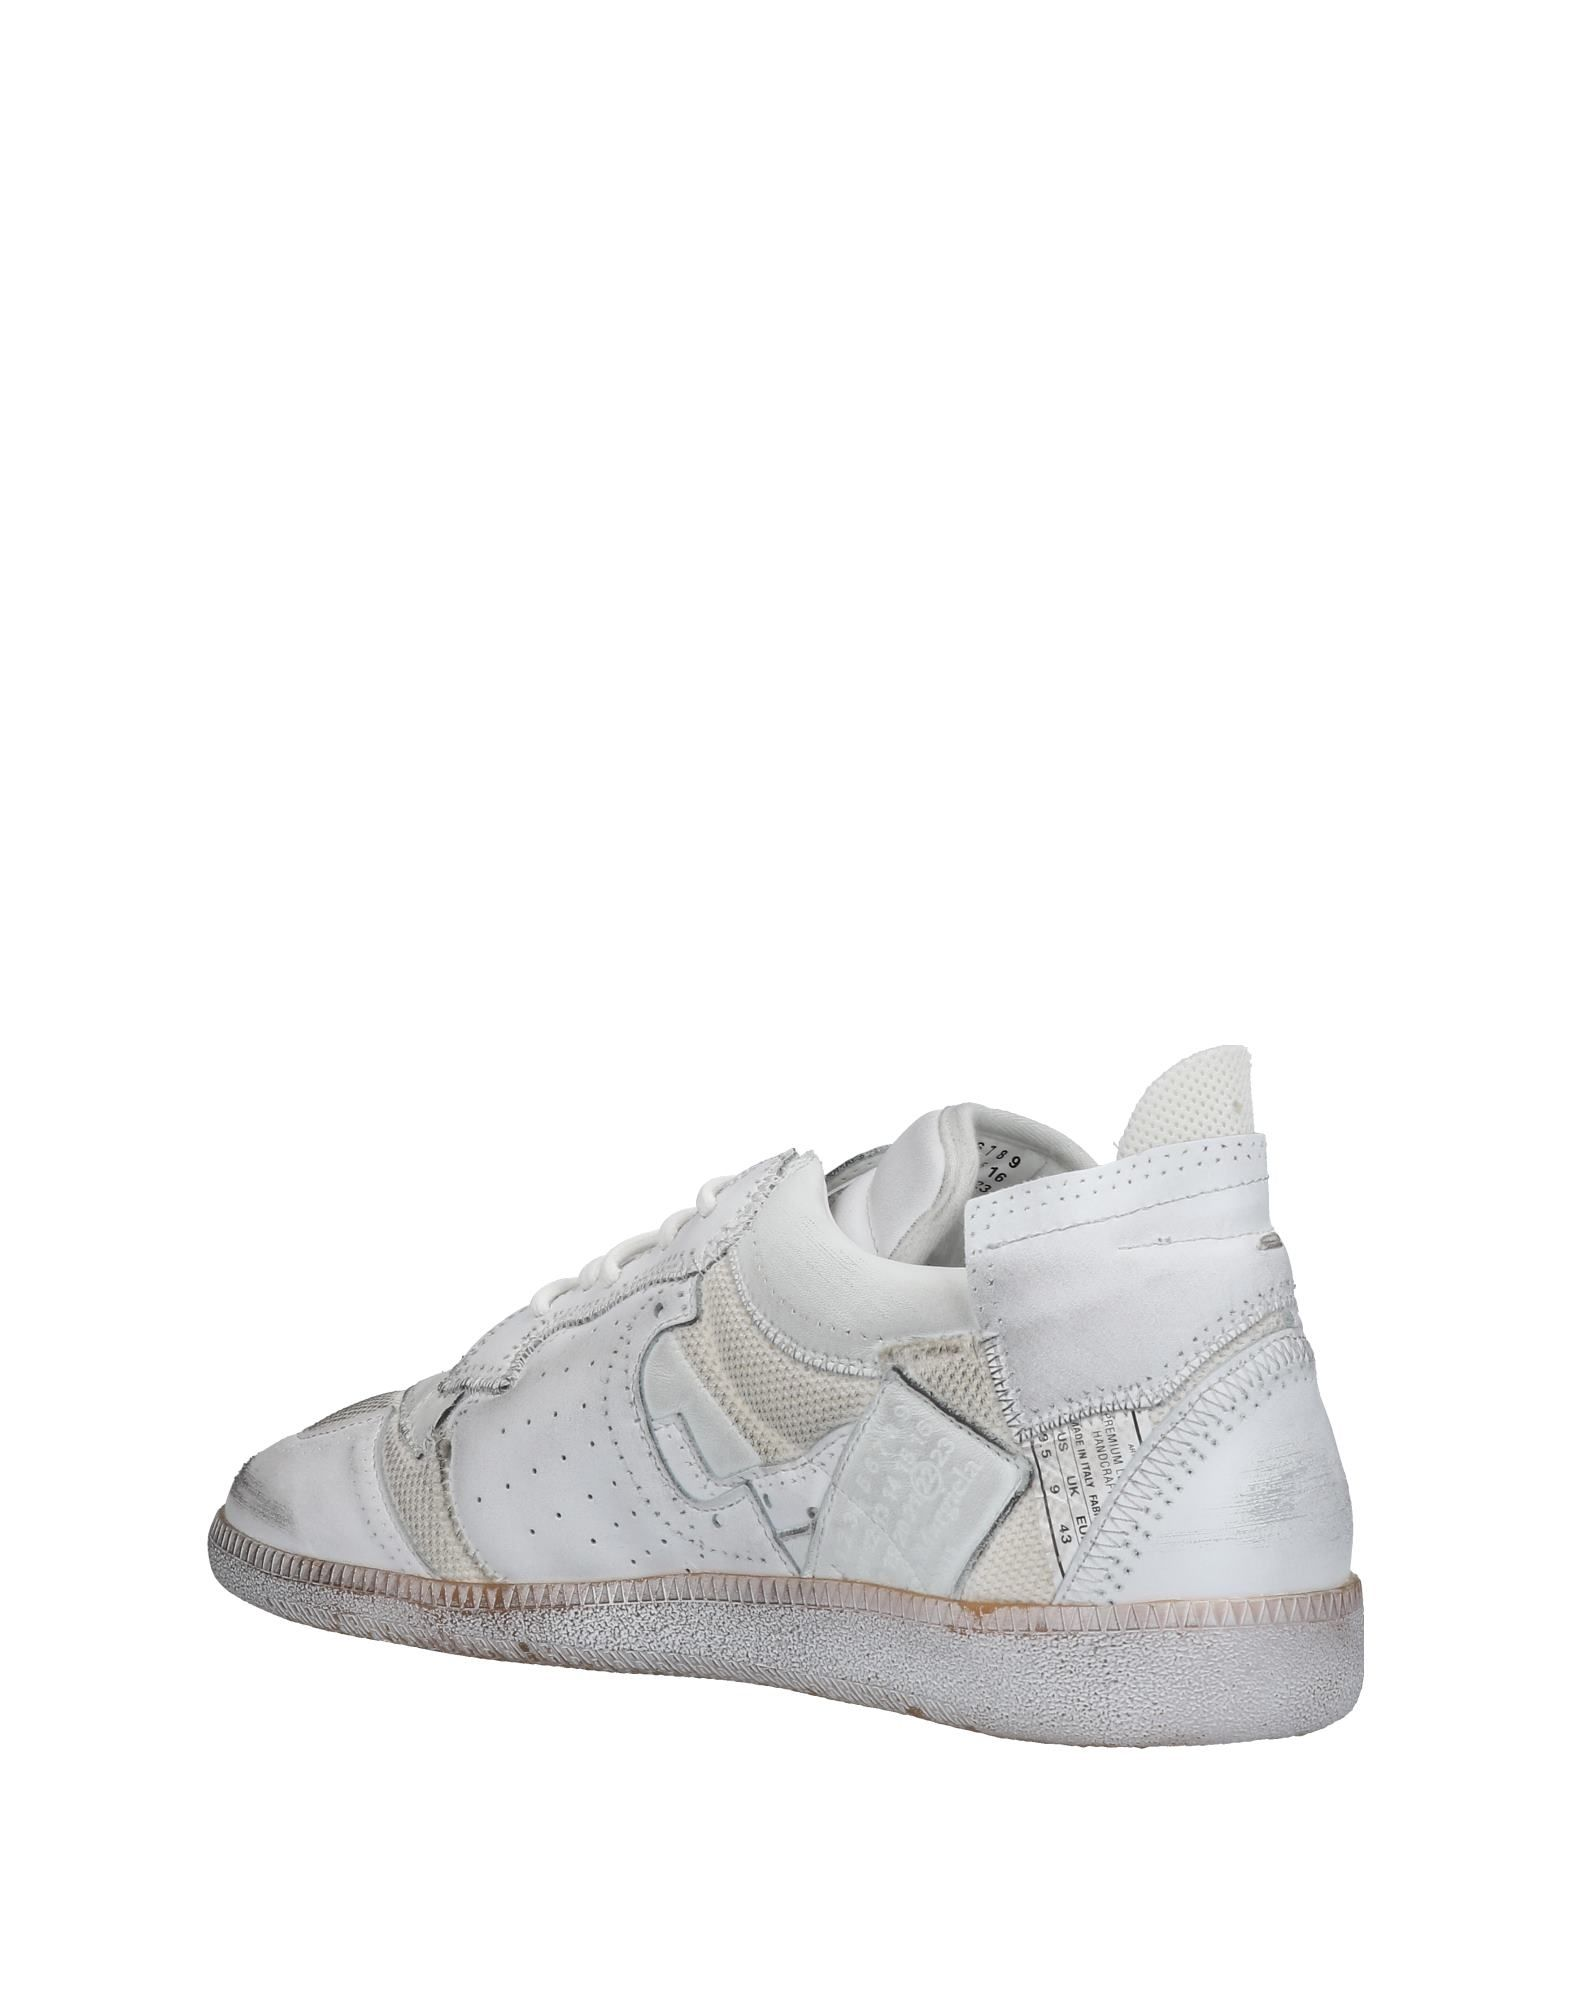 Maison Margiela Sneakers Qualität Herren  11439760KH Gute Qualität Sneakers beliebte Schuhe ce783c